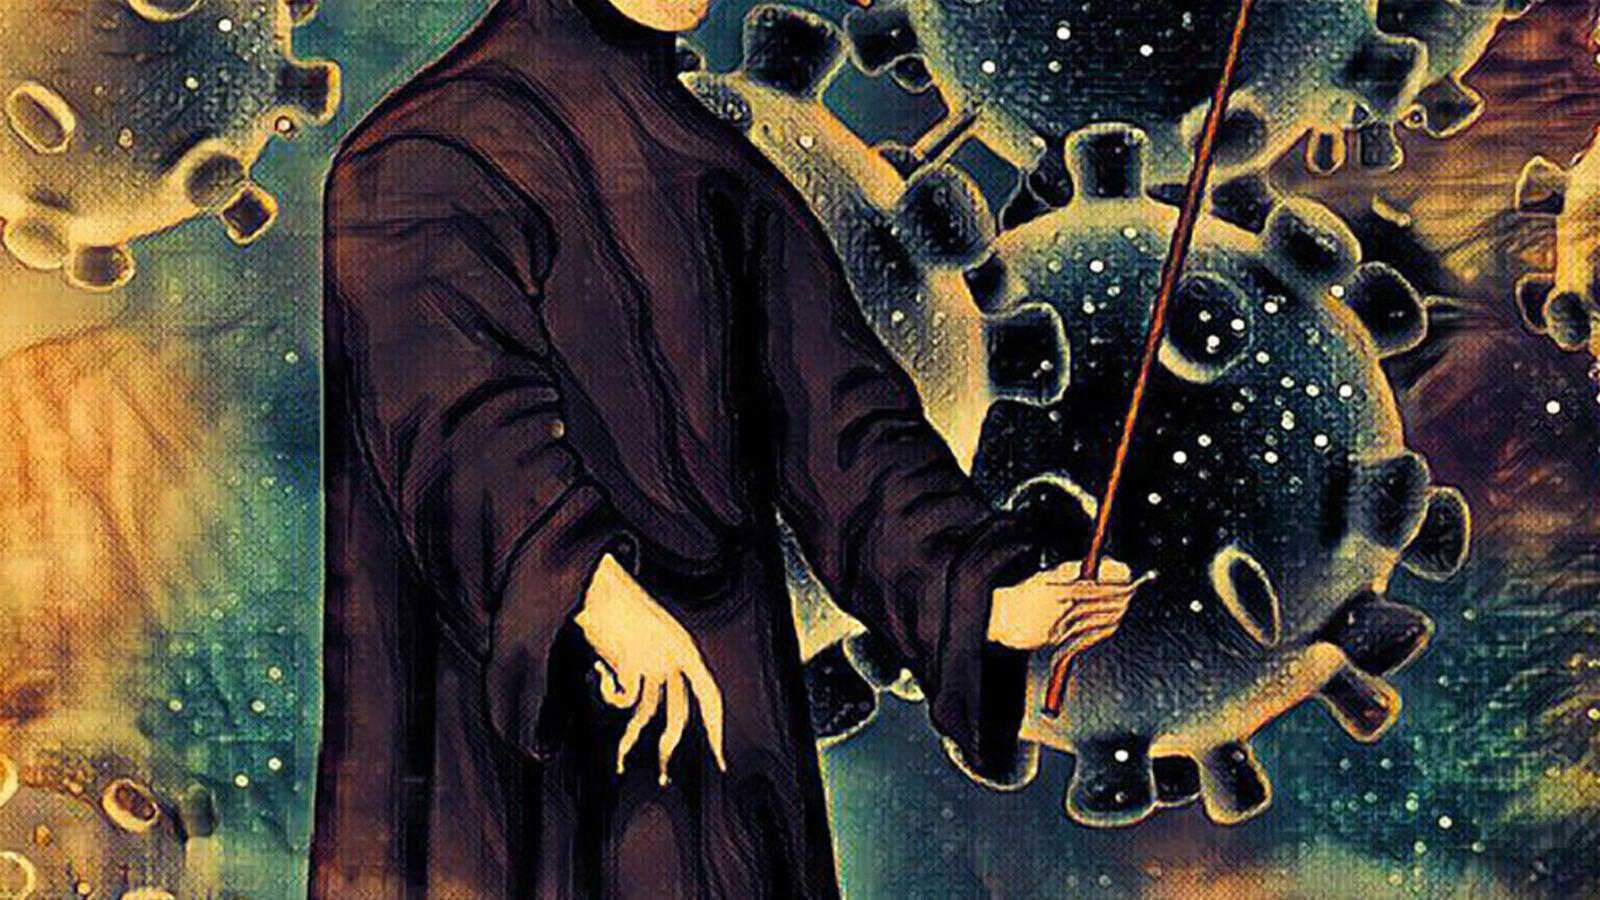 Plague doctor illustration.